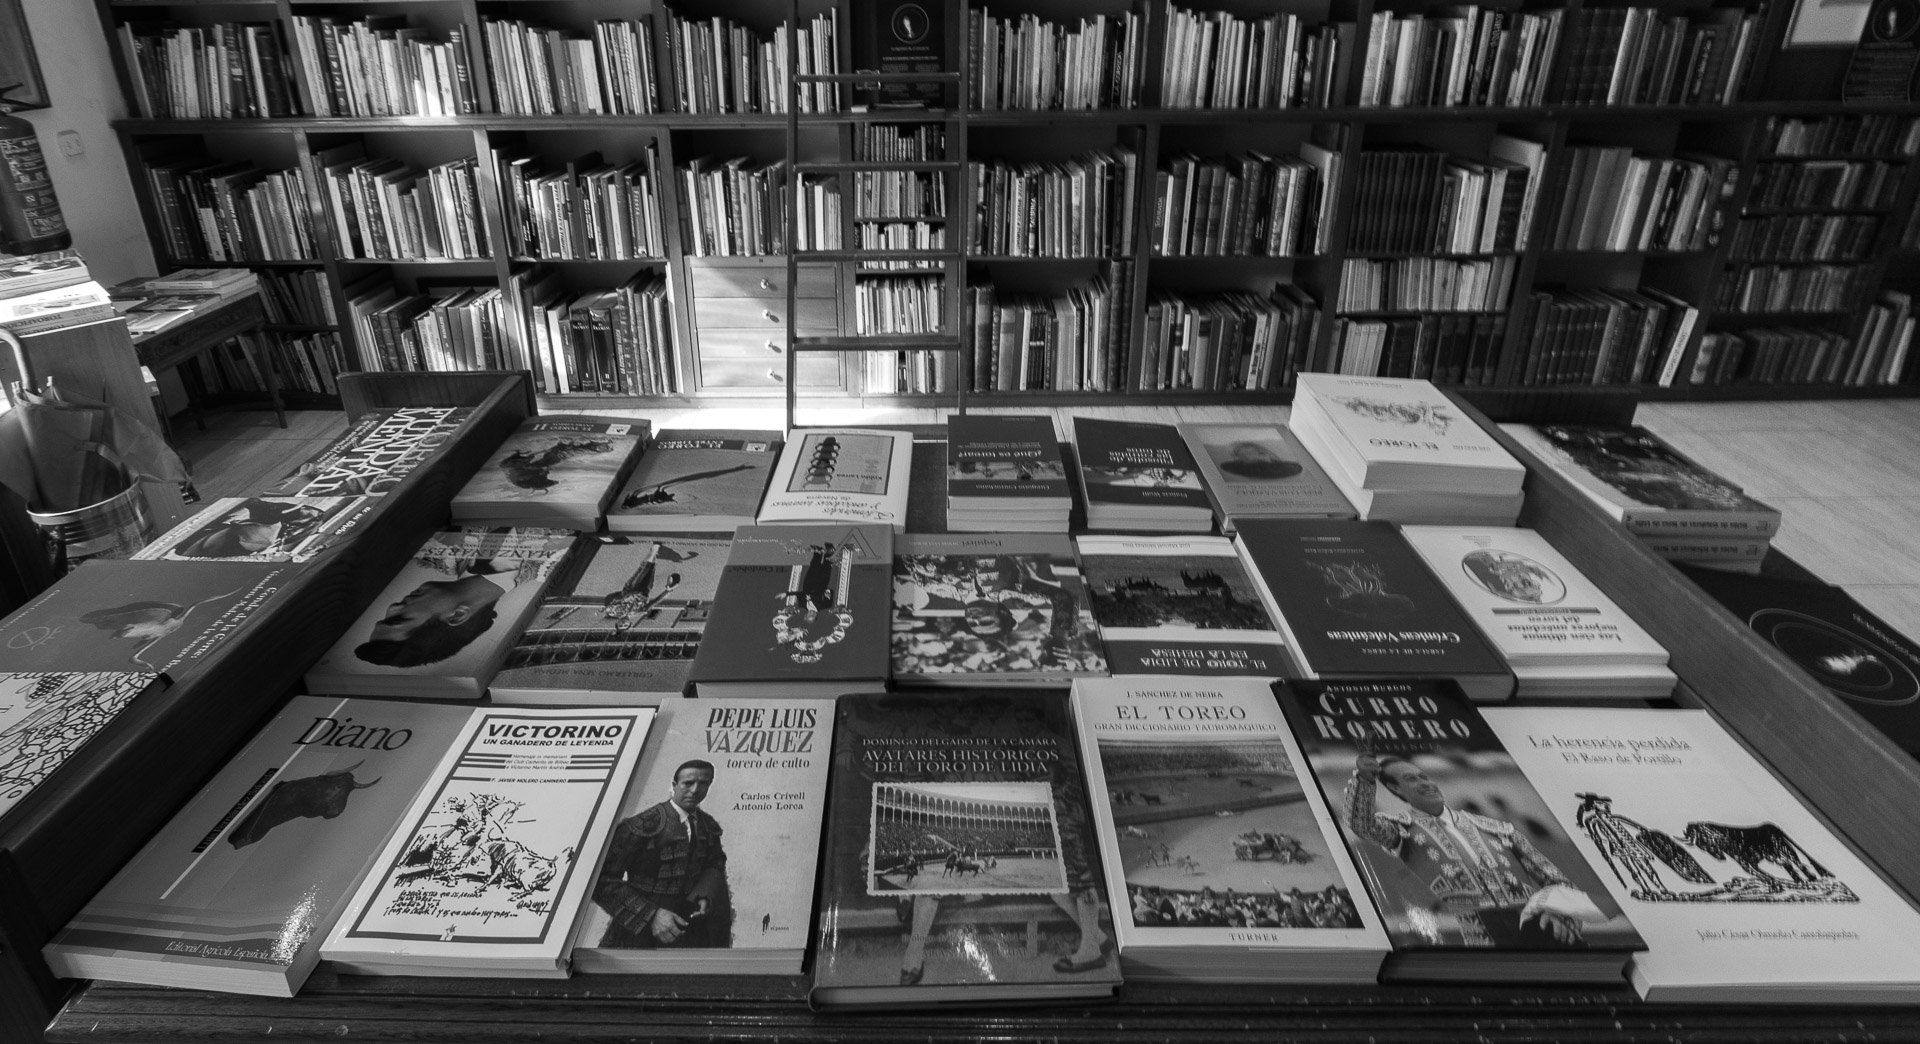 librerias-madrid-rodriguez-fina.jpg